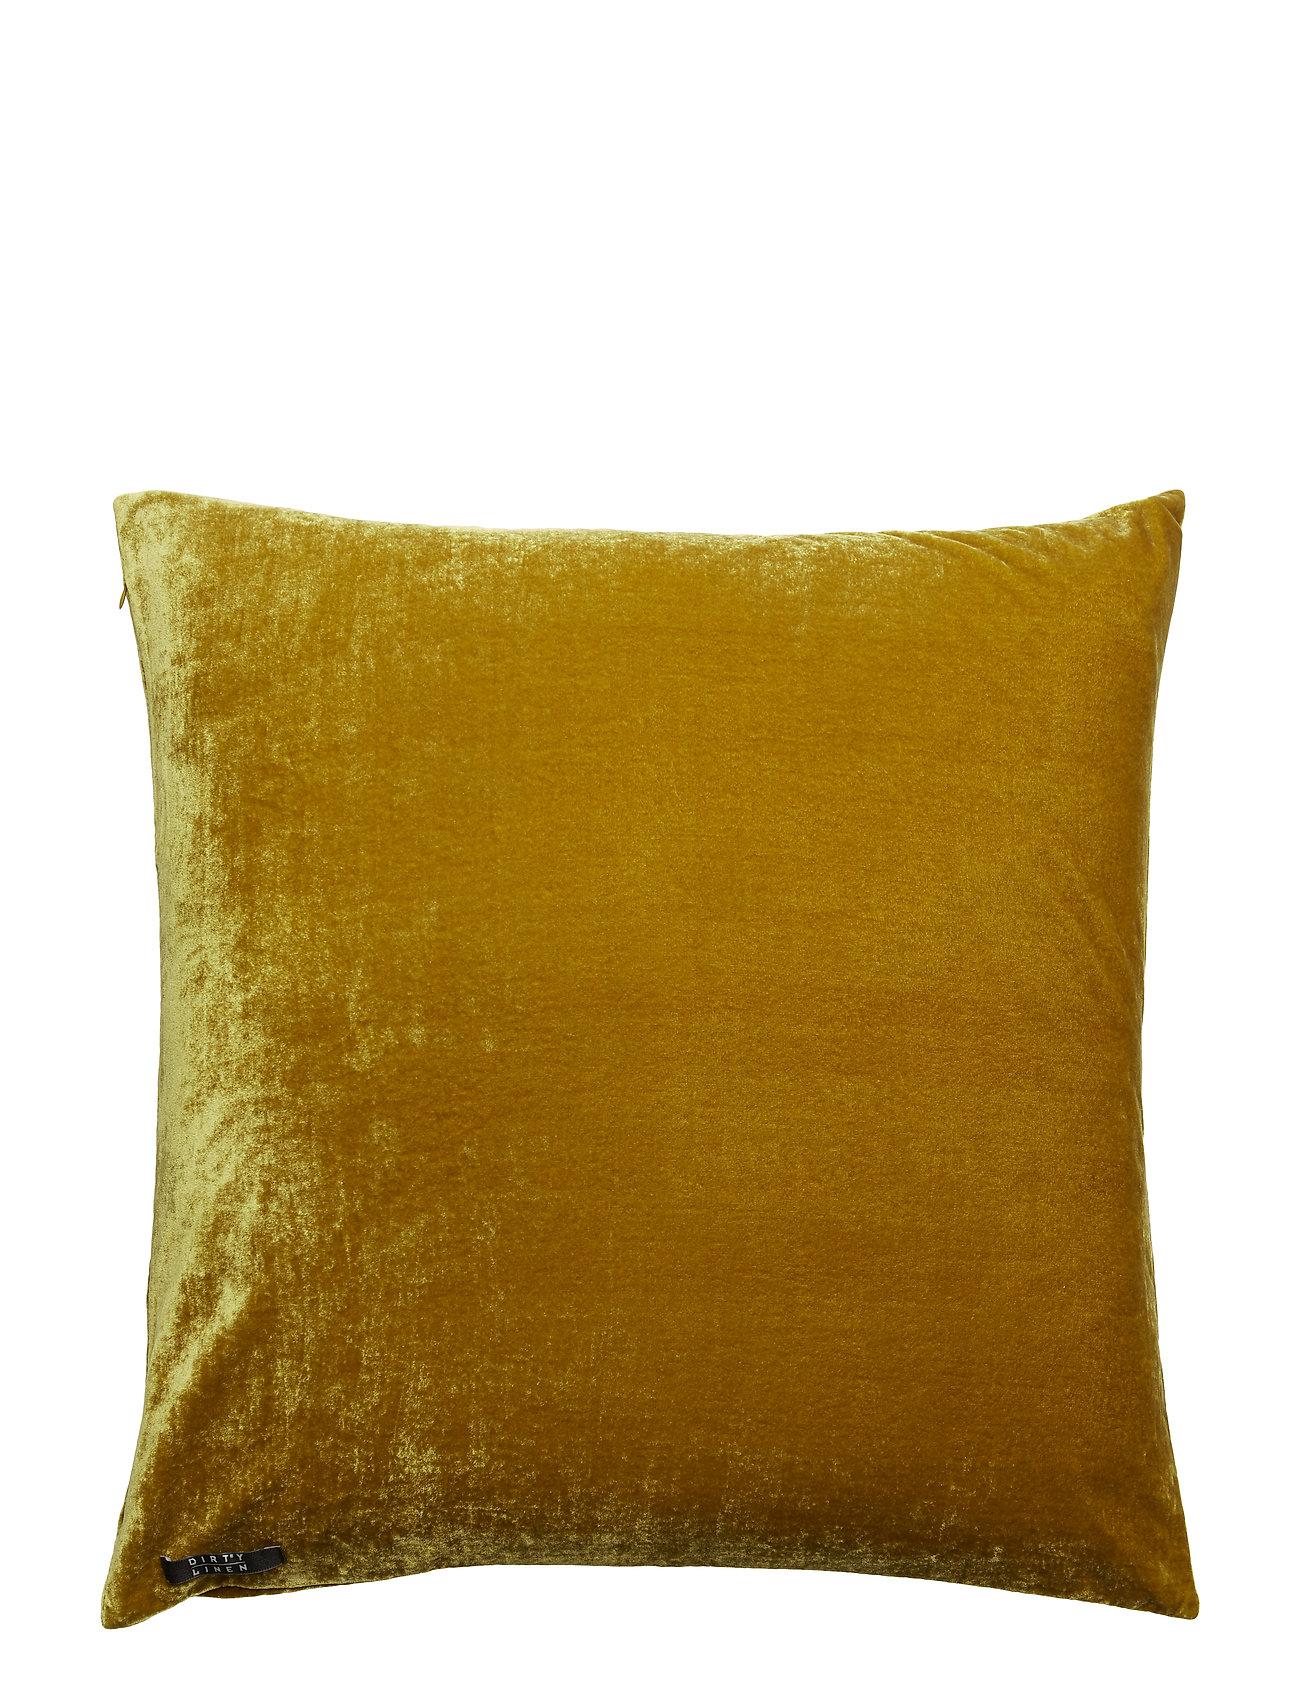 Dirty Linen Plain Decorative Cushion - MUSTY